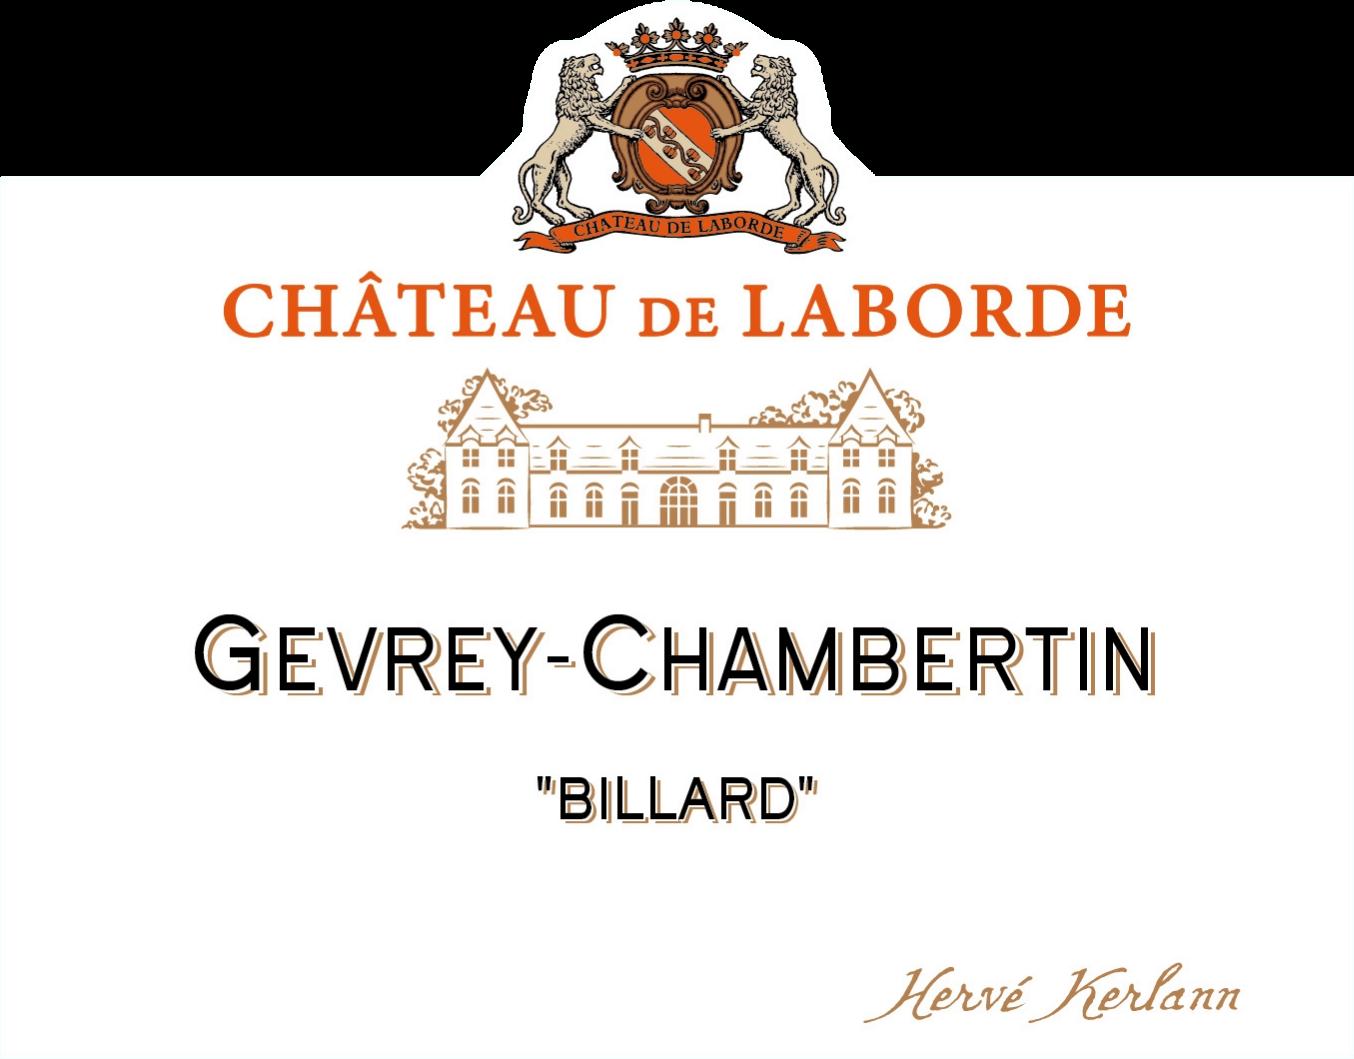 Gevrey Chambertin Billard - Chateau de Laborde NV